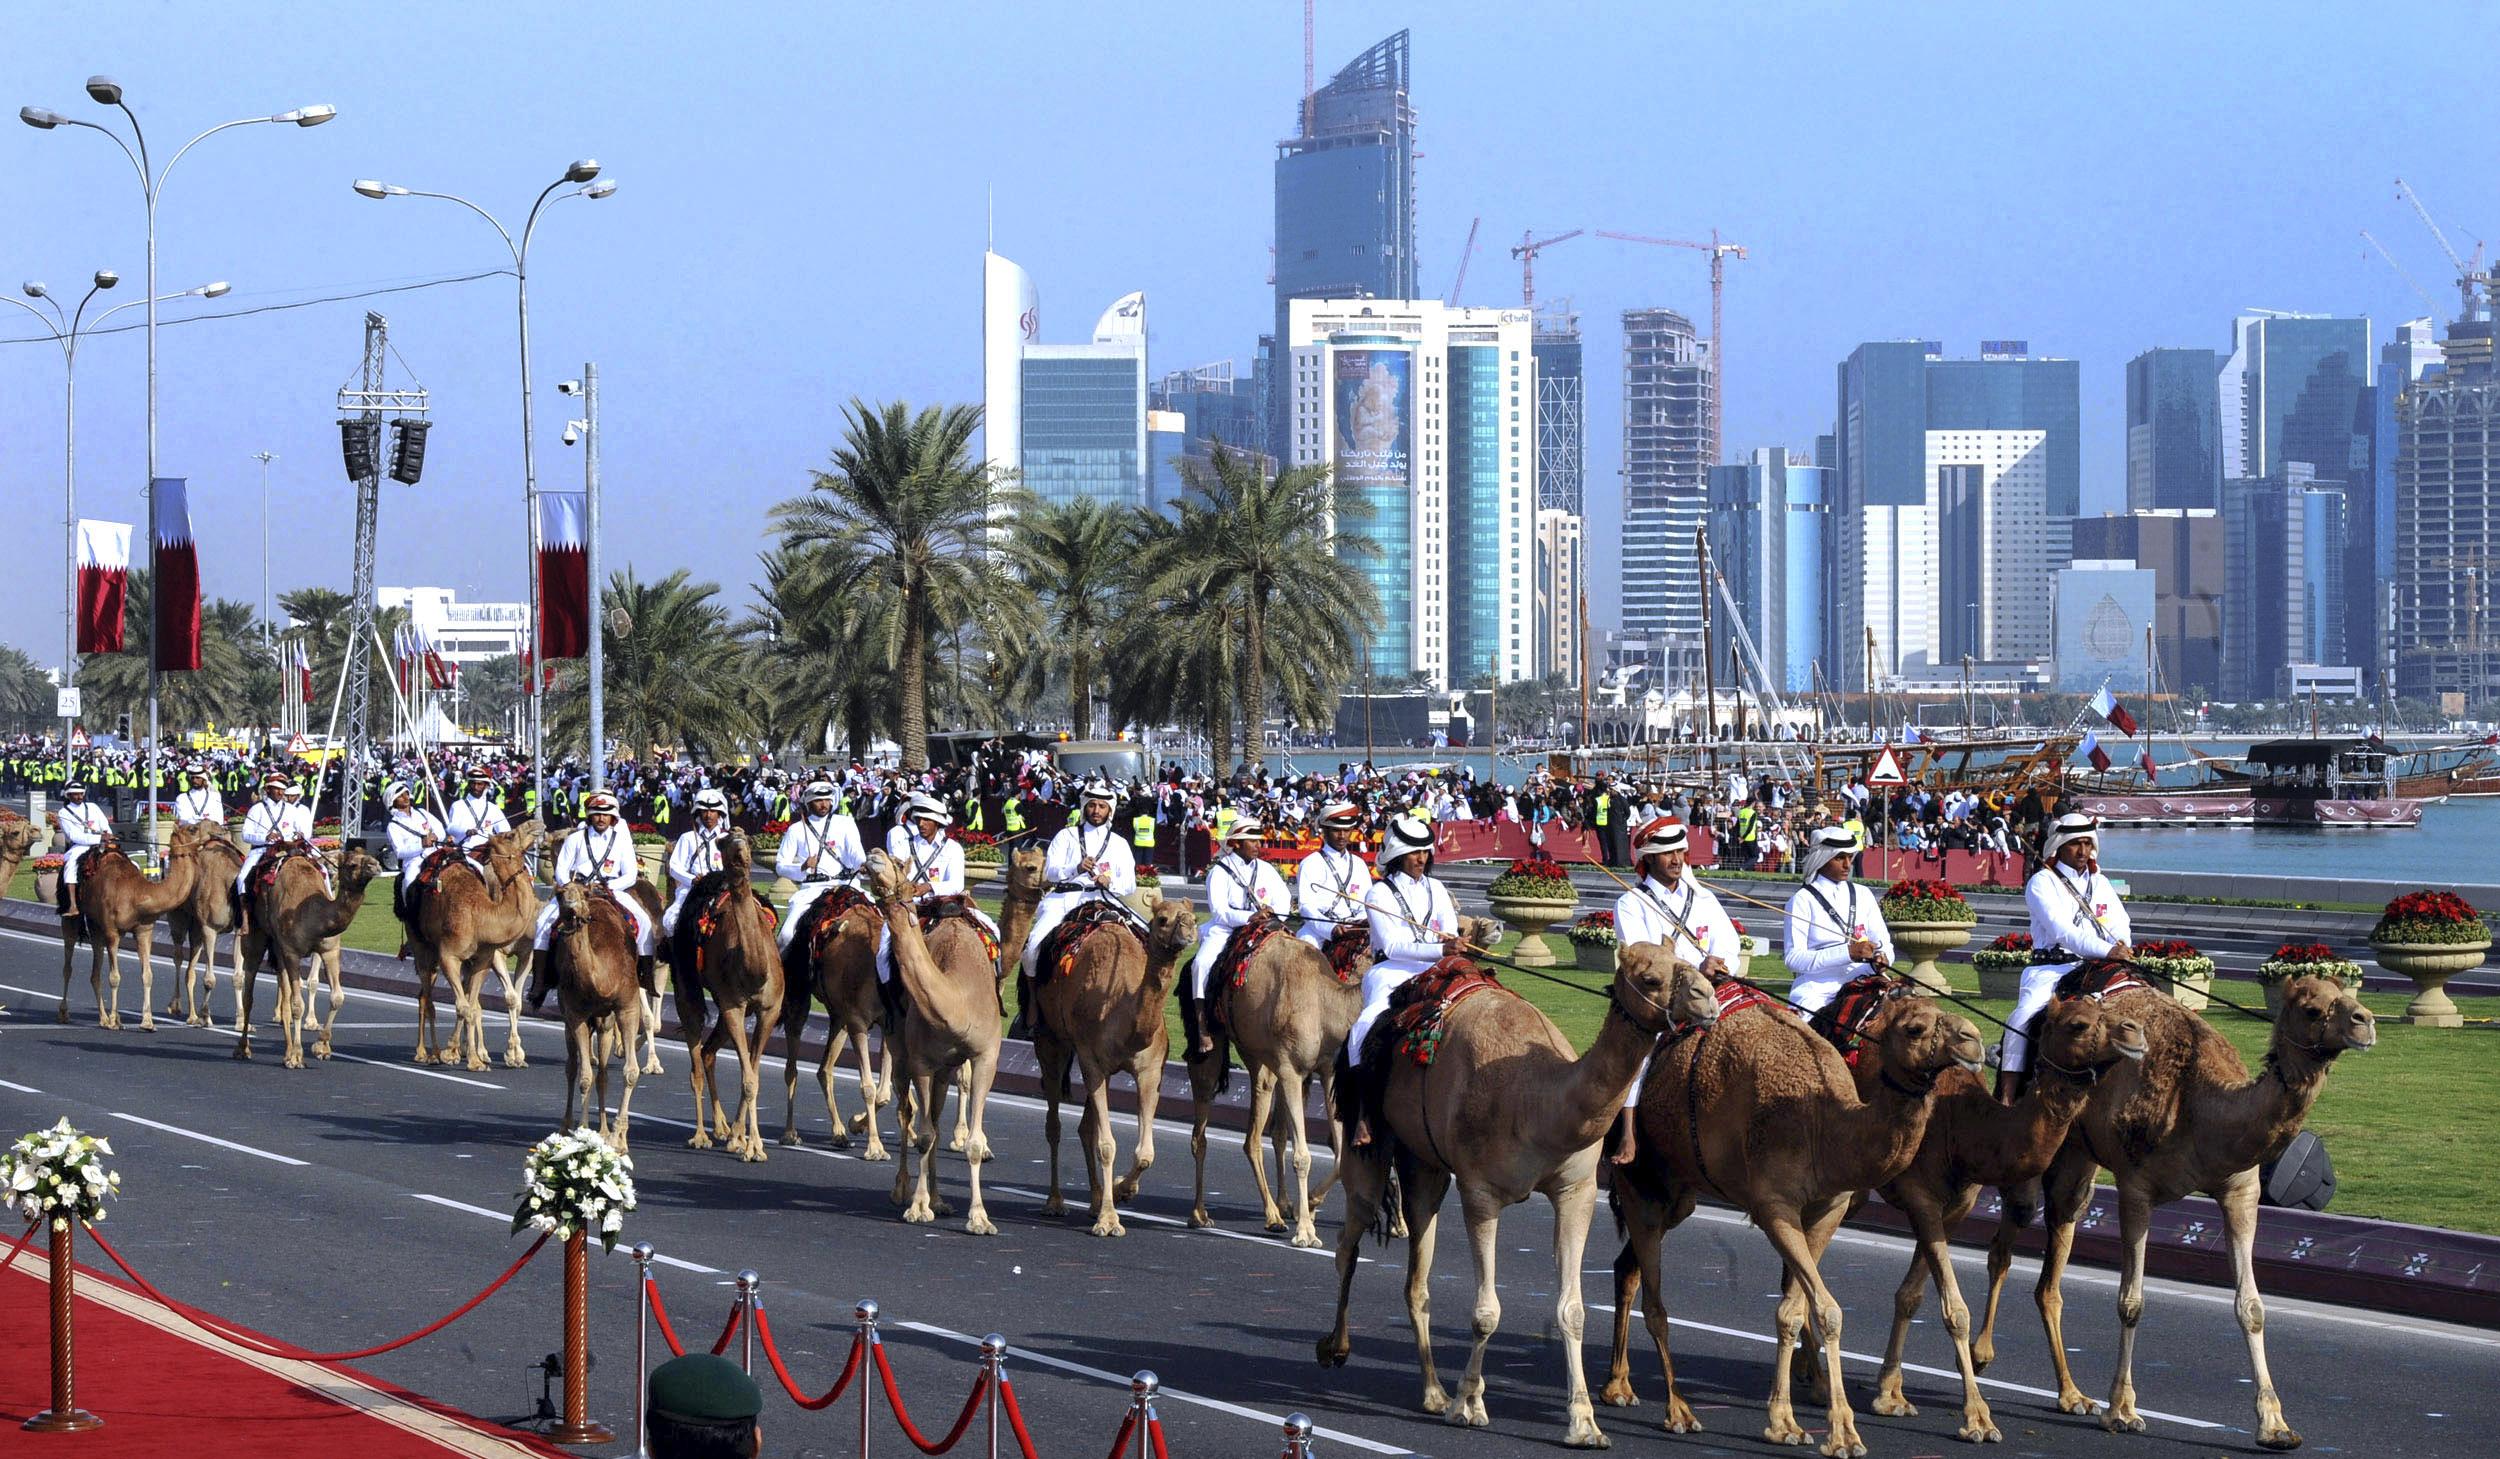 qatar_camels_enl-52fd014fd690ea5a678bb7b82394db760235fcb9.jpg